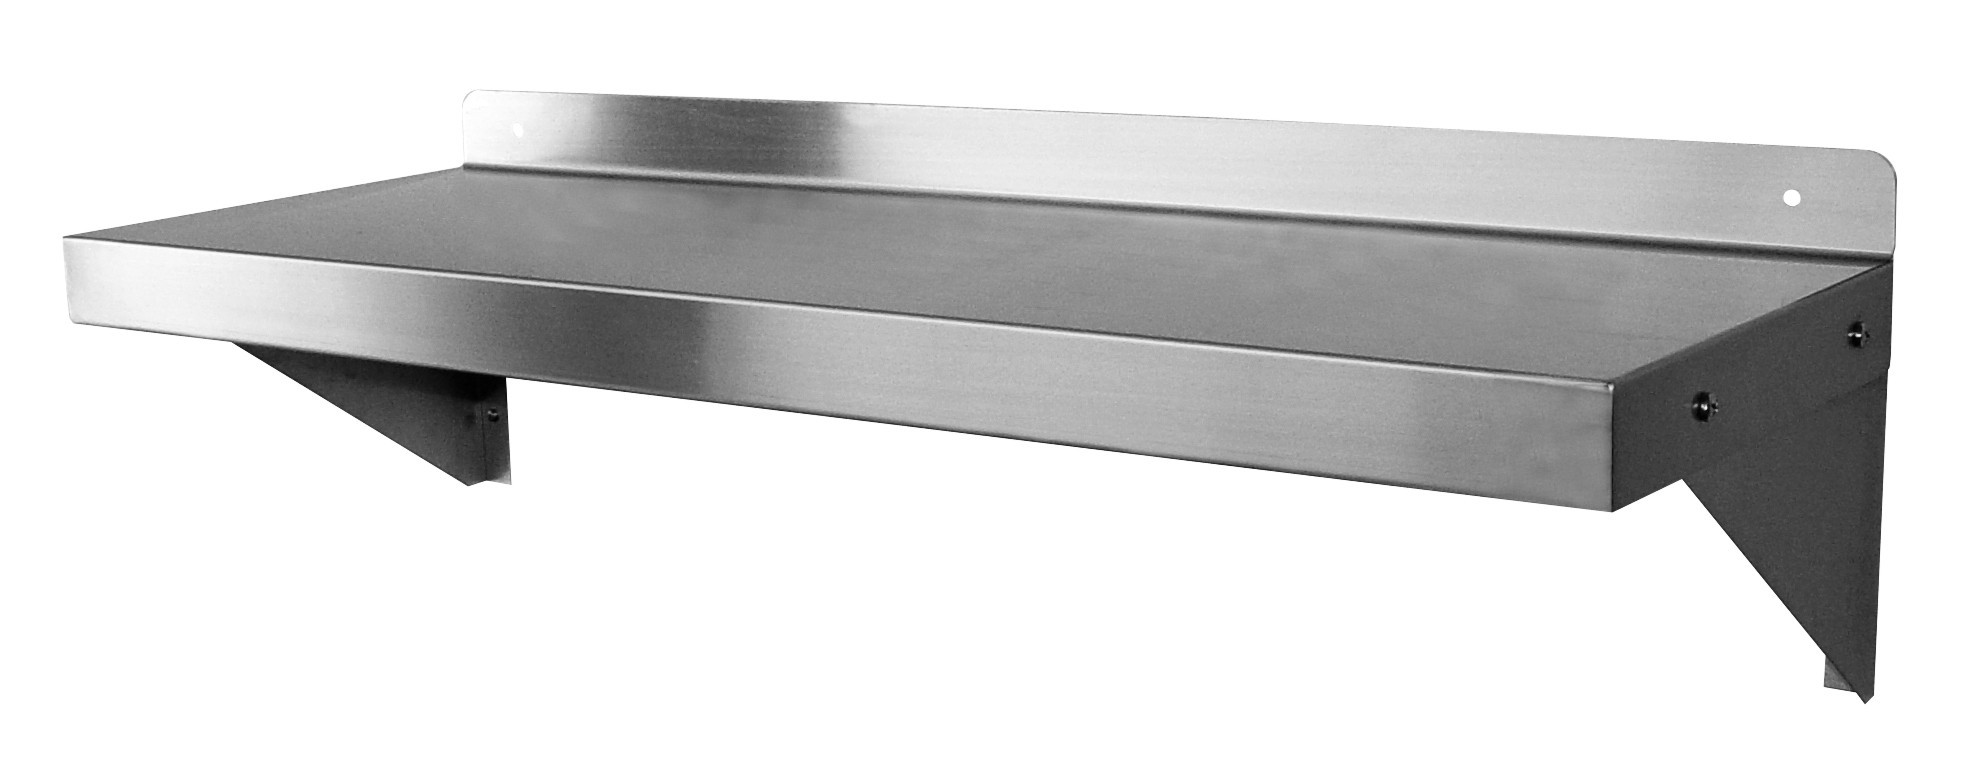 Stainless steel wall mount shelf gsw